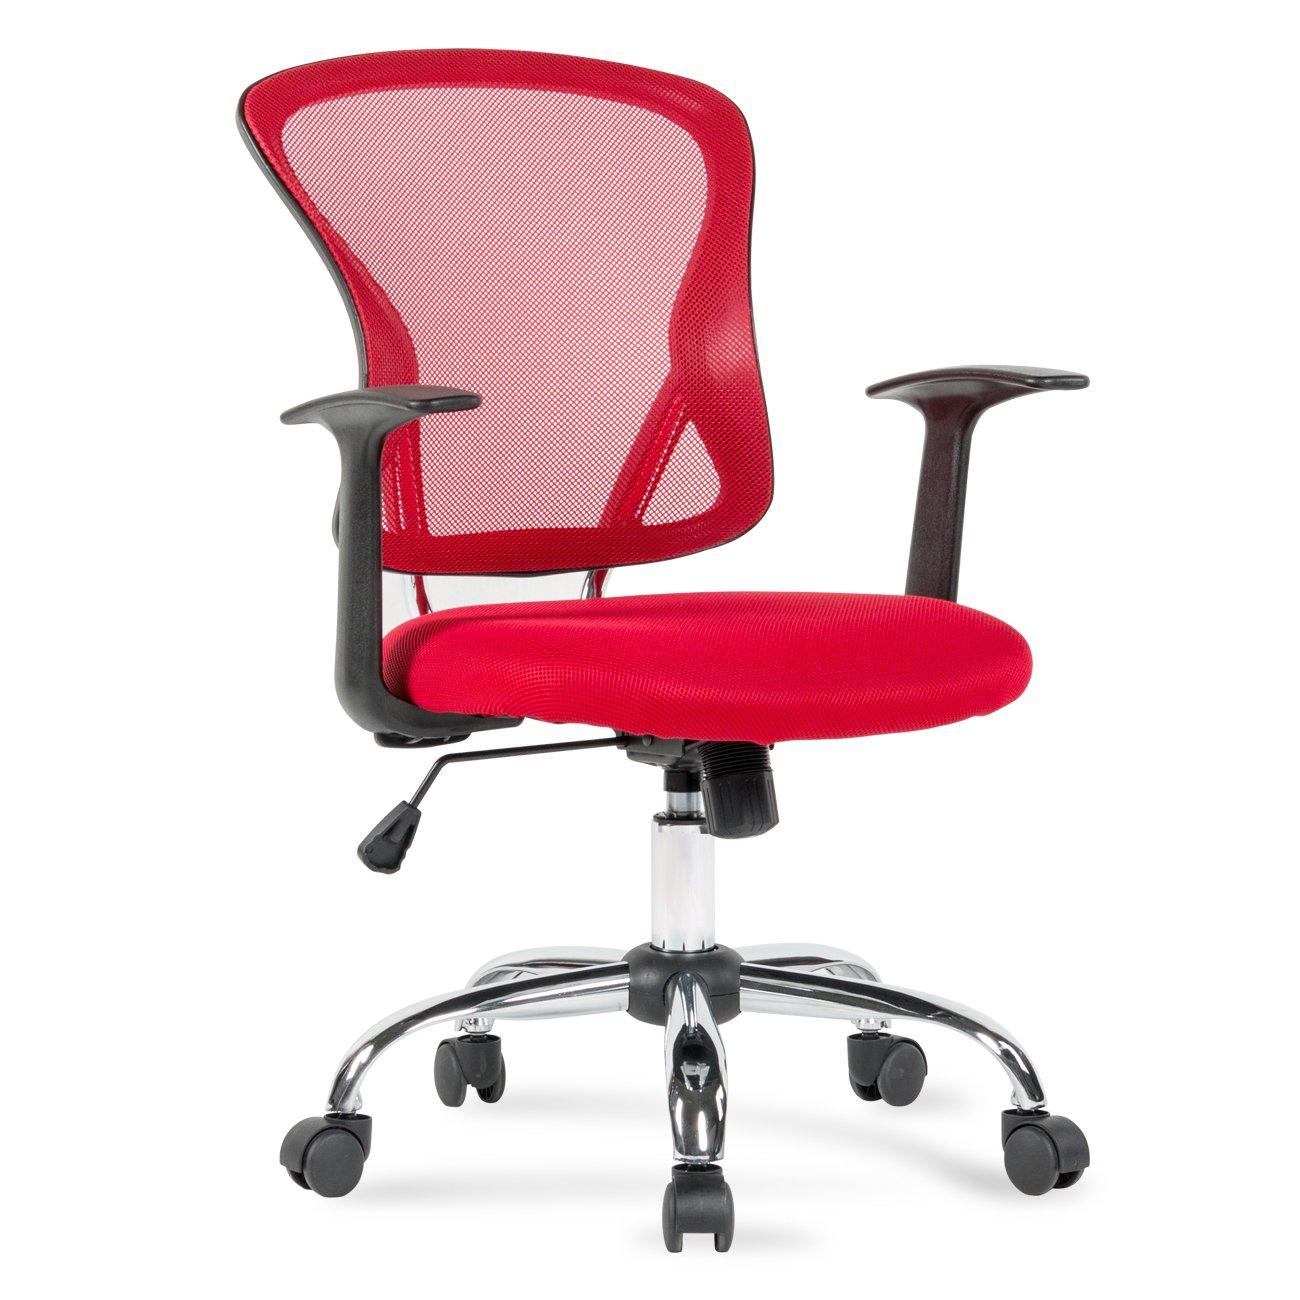 Belleze Desk Office Chair Mid Back Mesh Ergonomic Computer Task Midback Adjustable Seat, Red